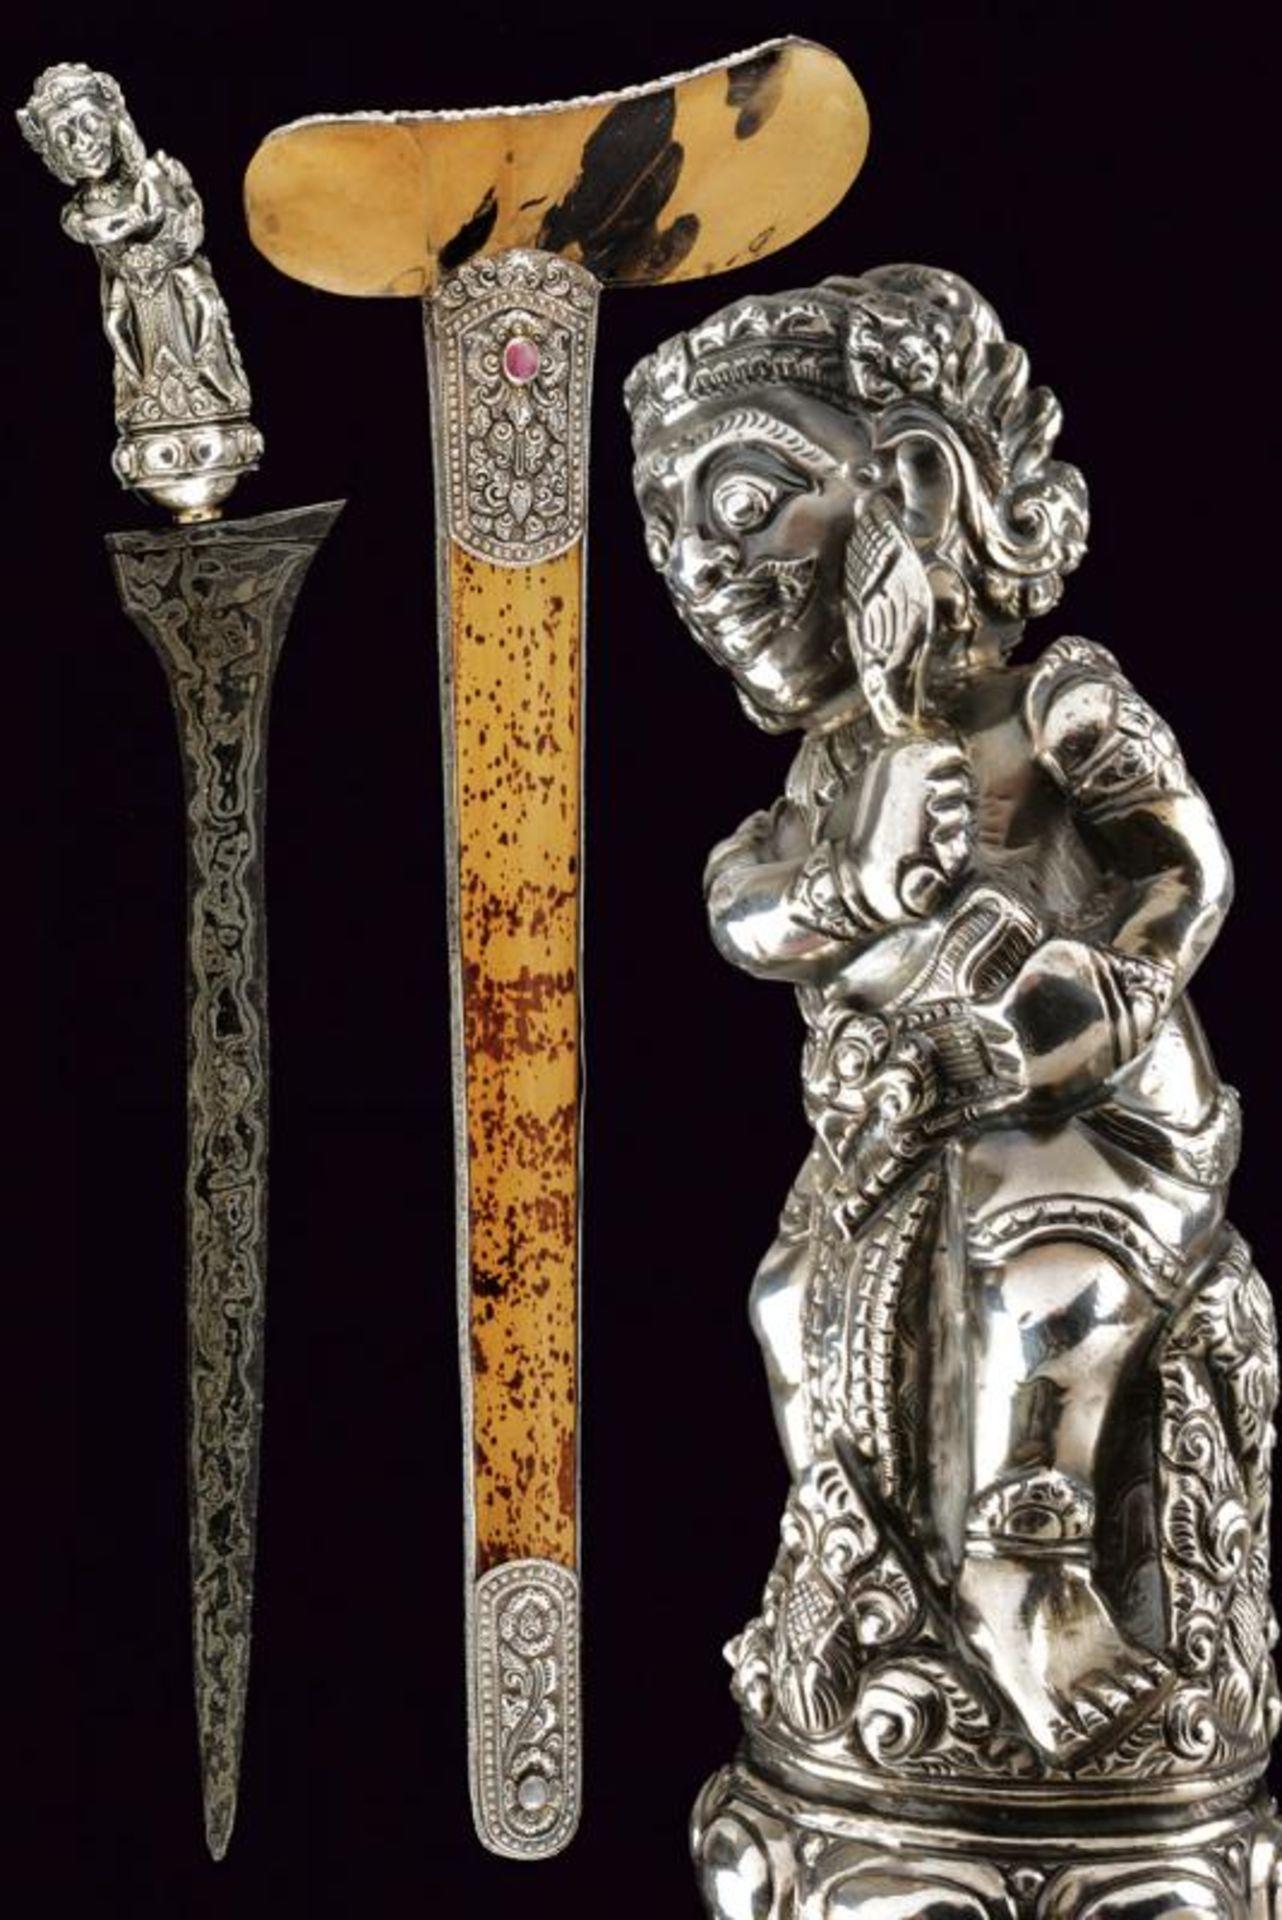 A beautiful silver mounted kris